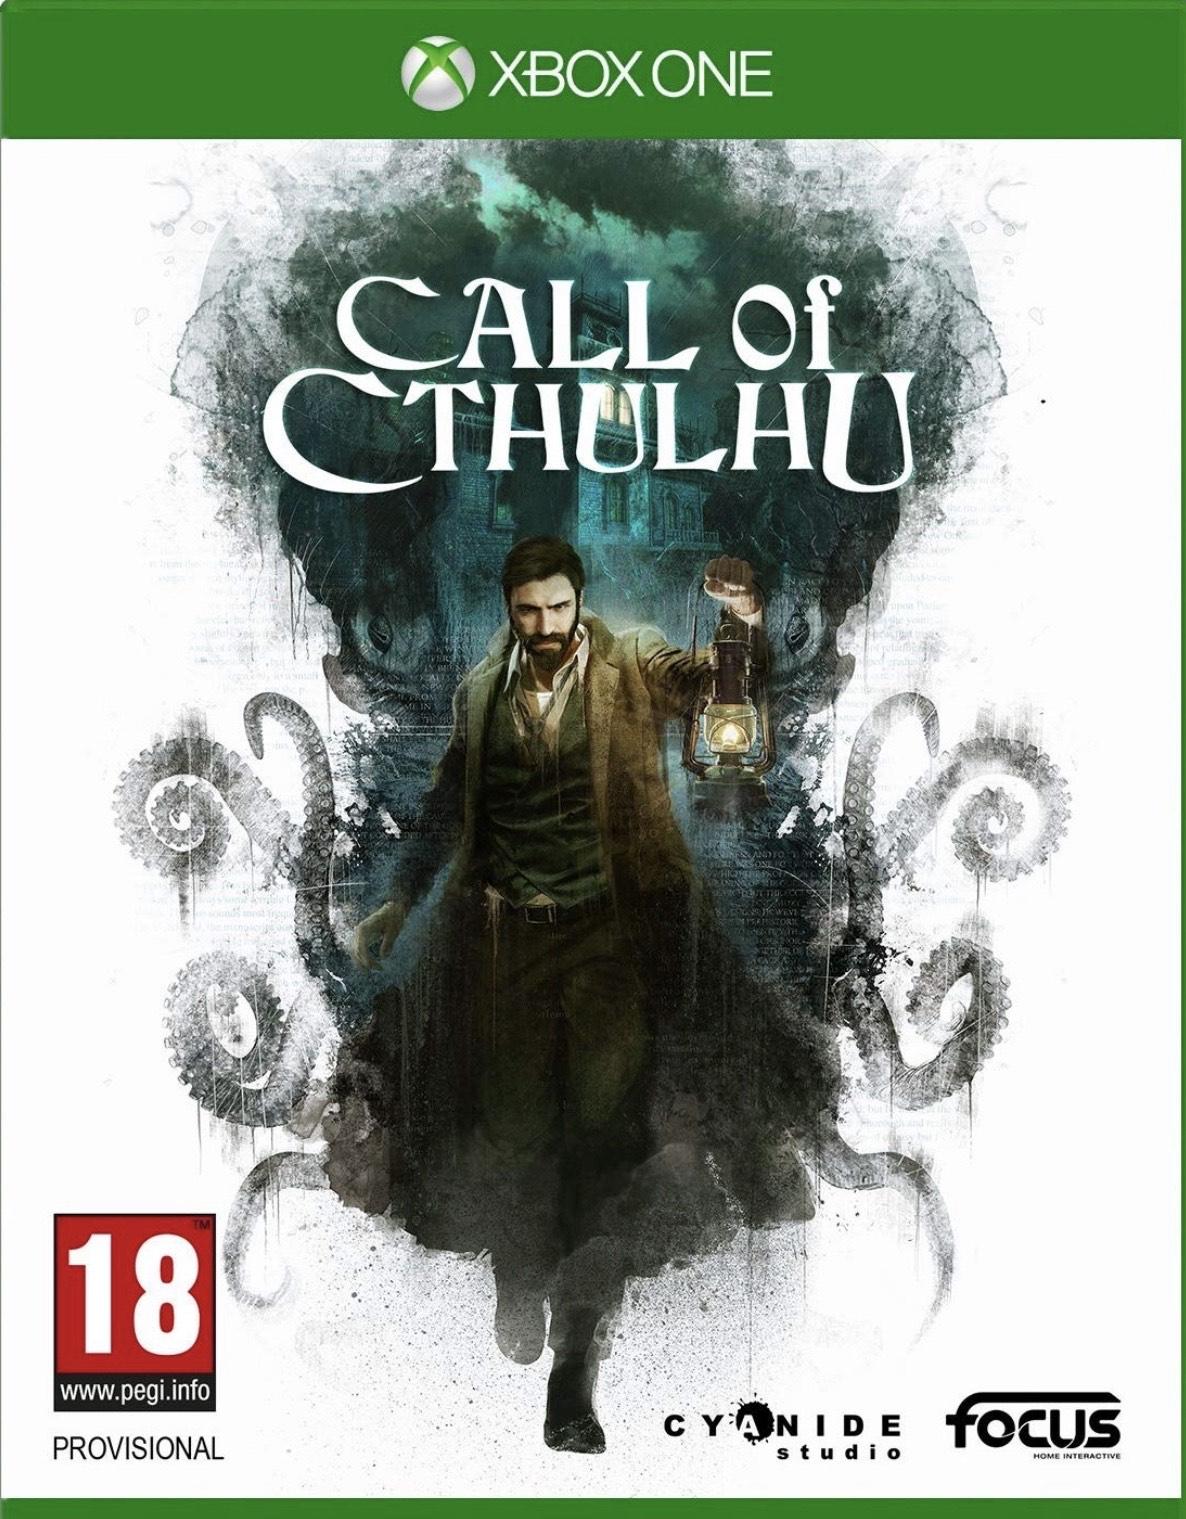 Call of Cthulhu (Xbox One) - £8.74 @ Microsoft Store